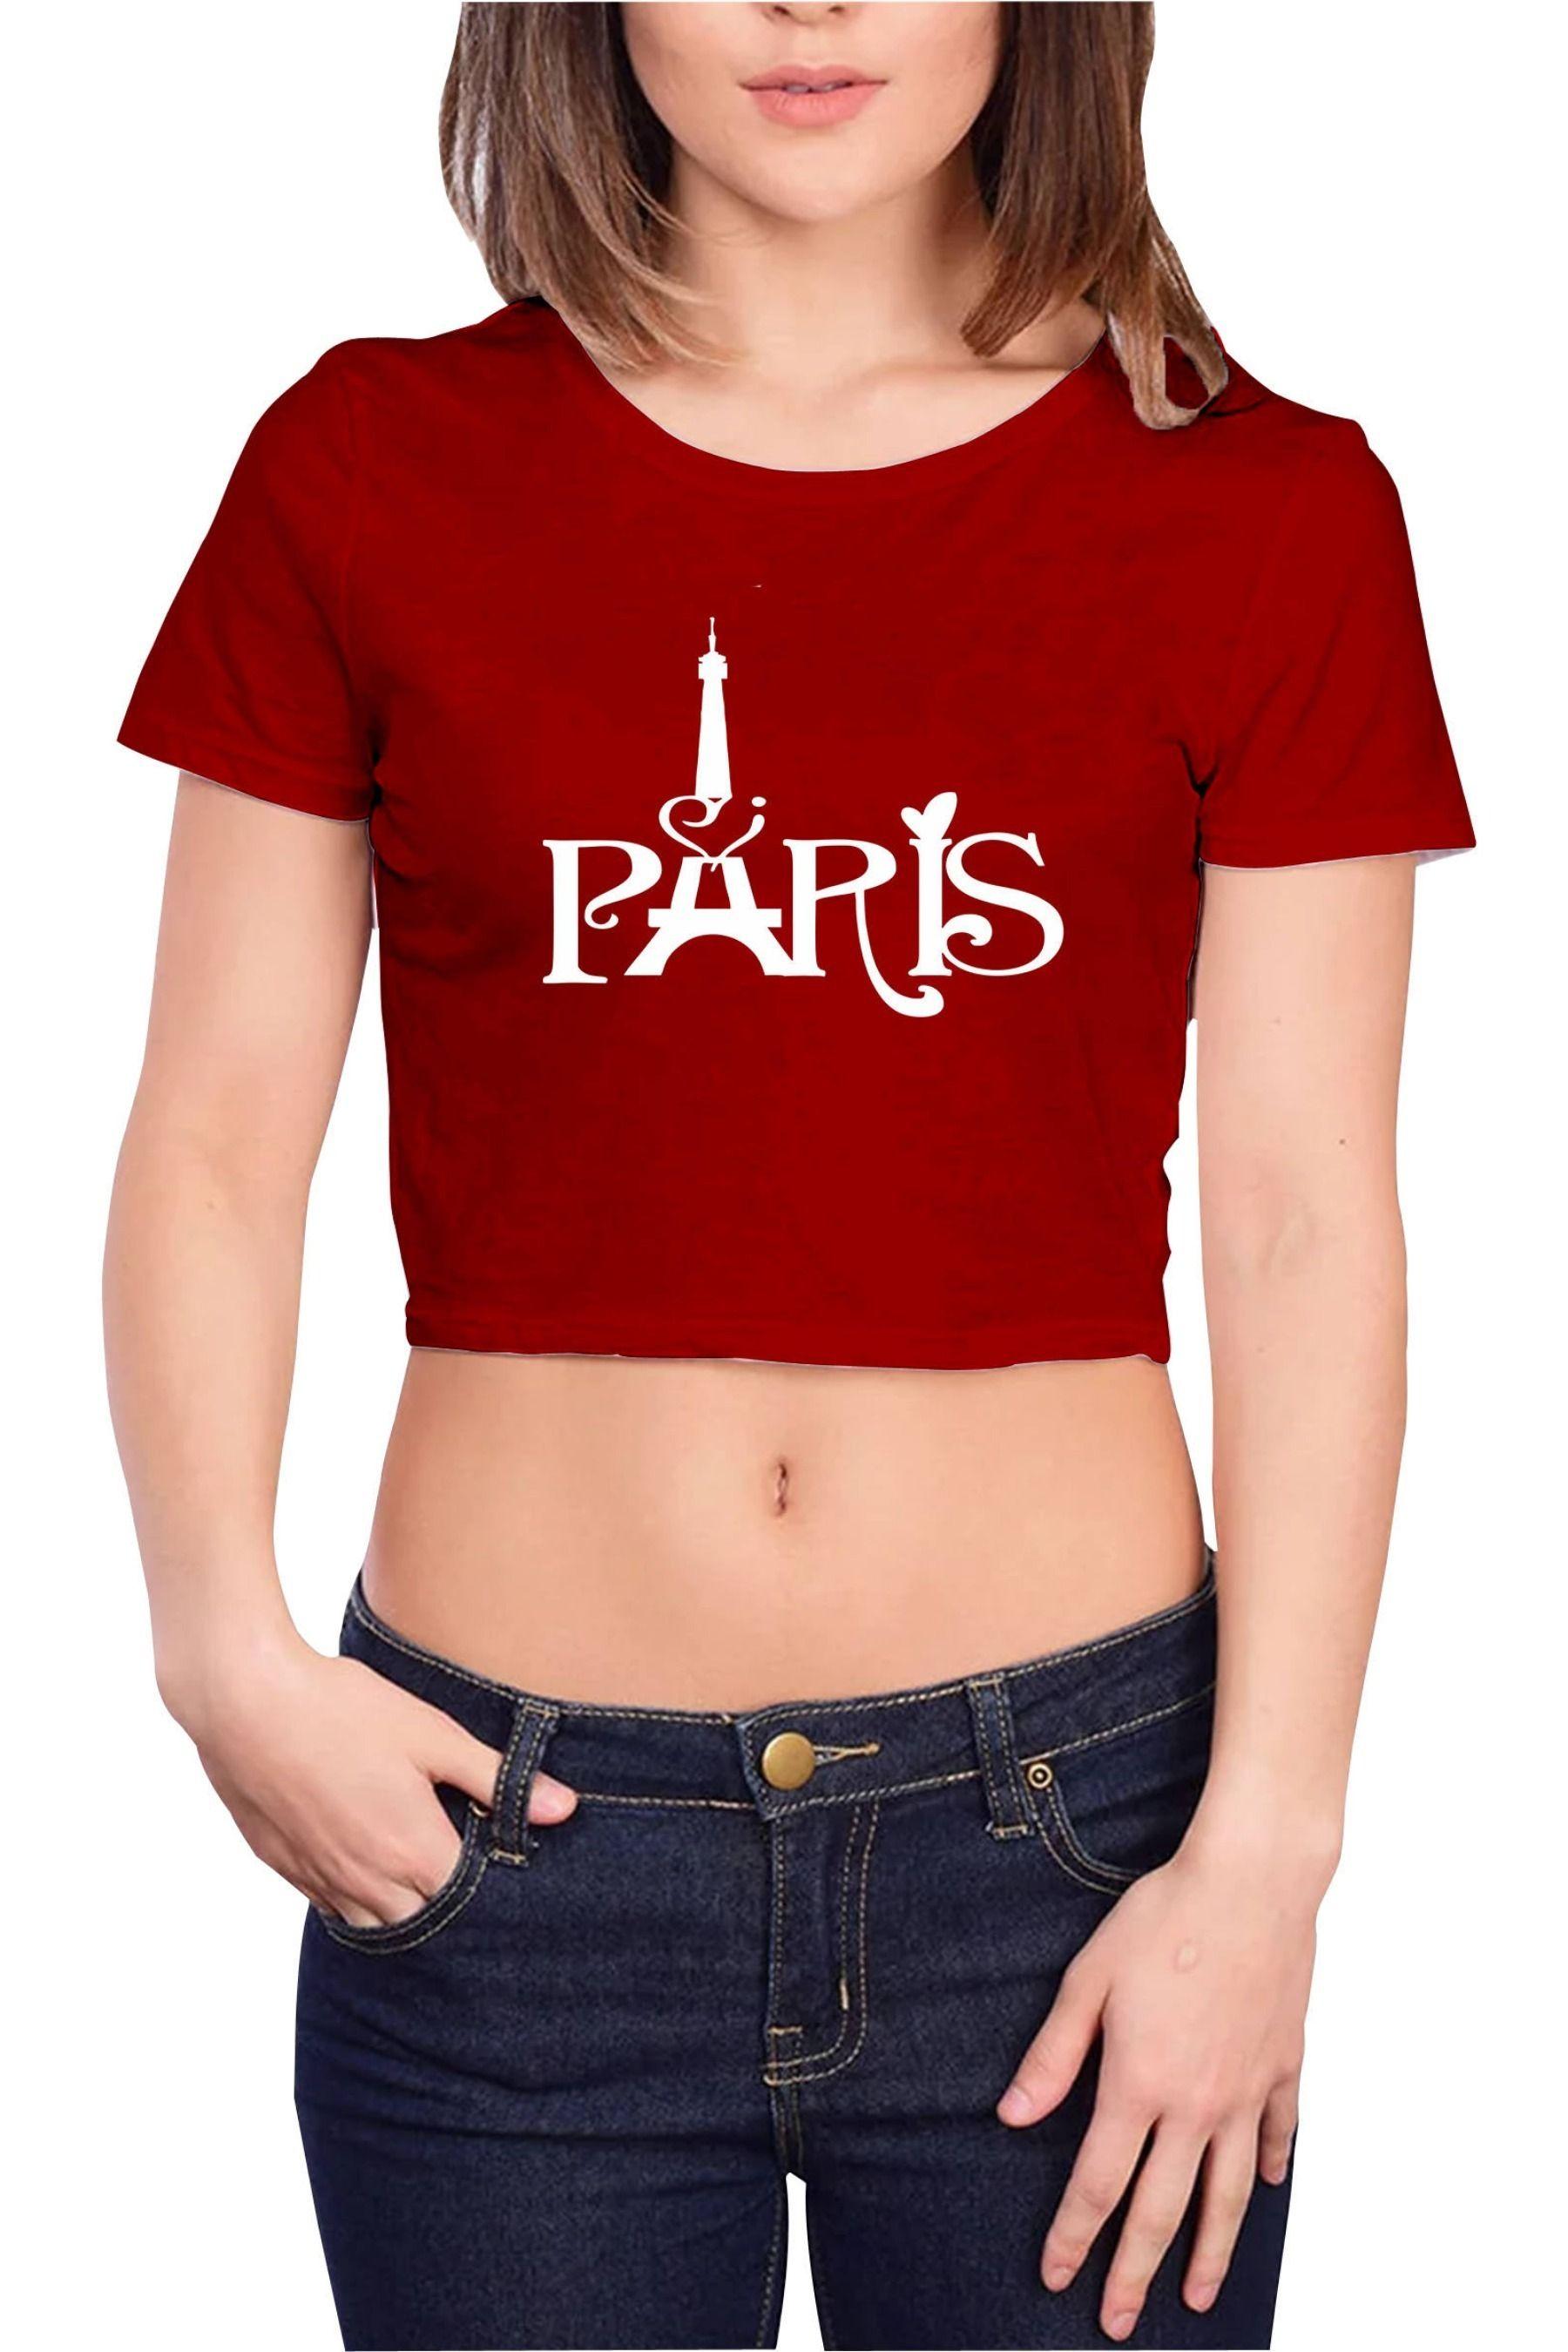 bea468e93fd women western wear tops tees shirts buy now  shopping  fashion  online   tees  top  womenfashion  red  white  india  men